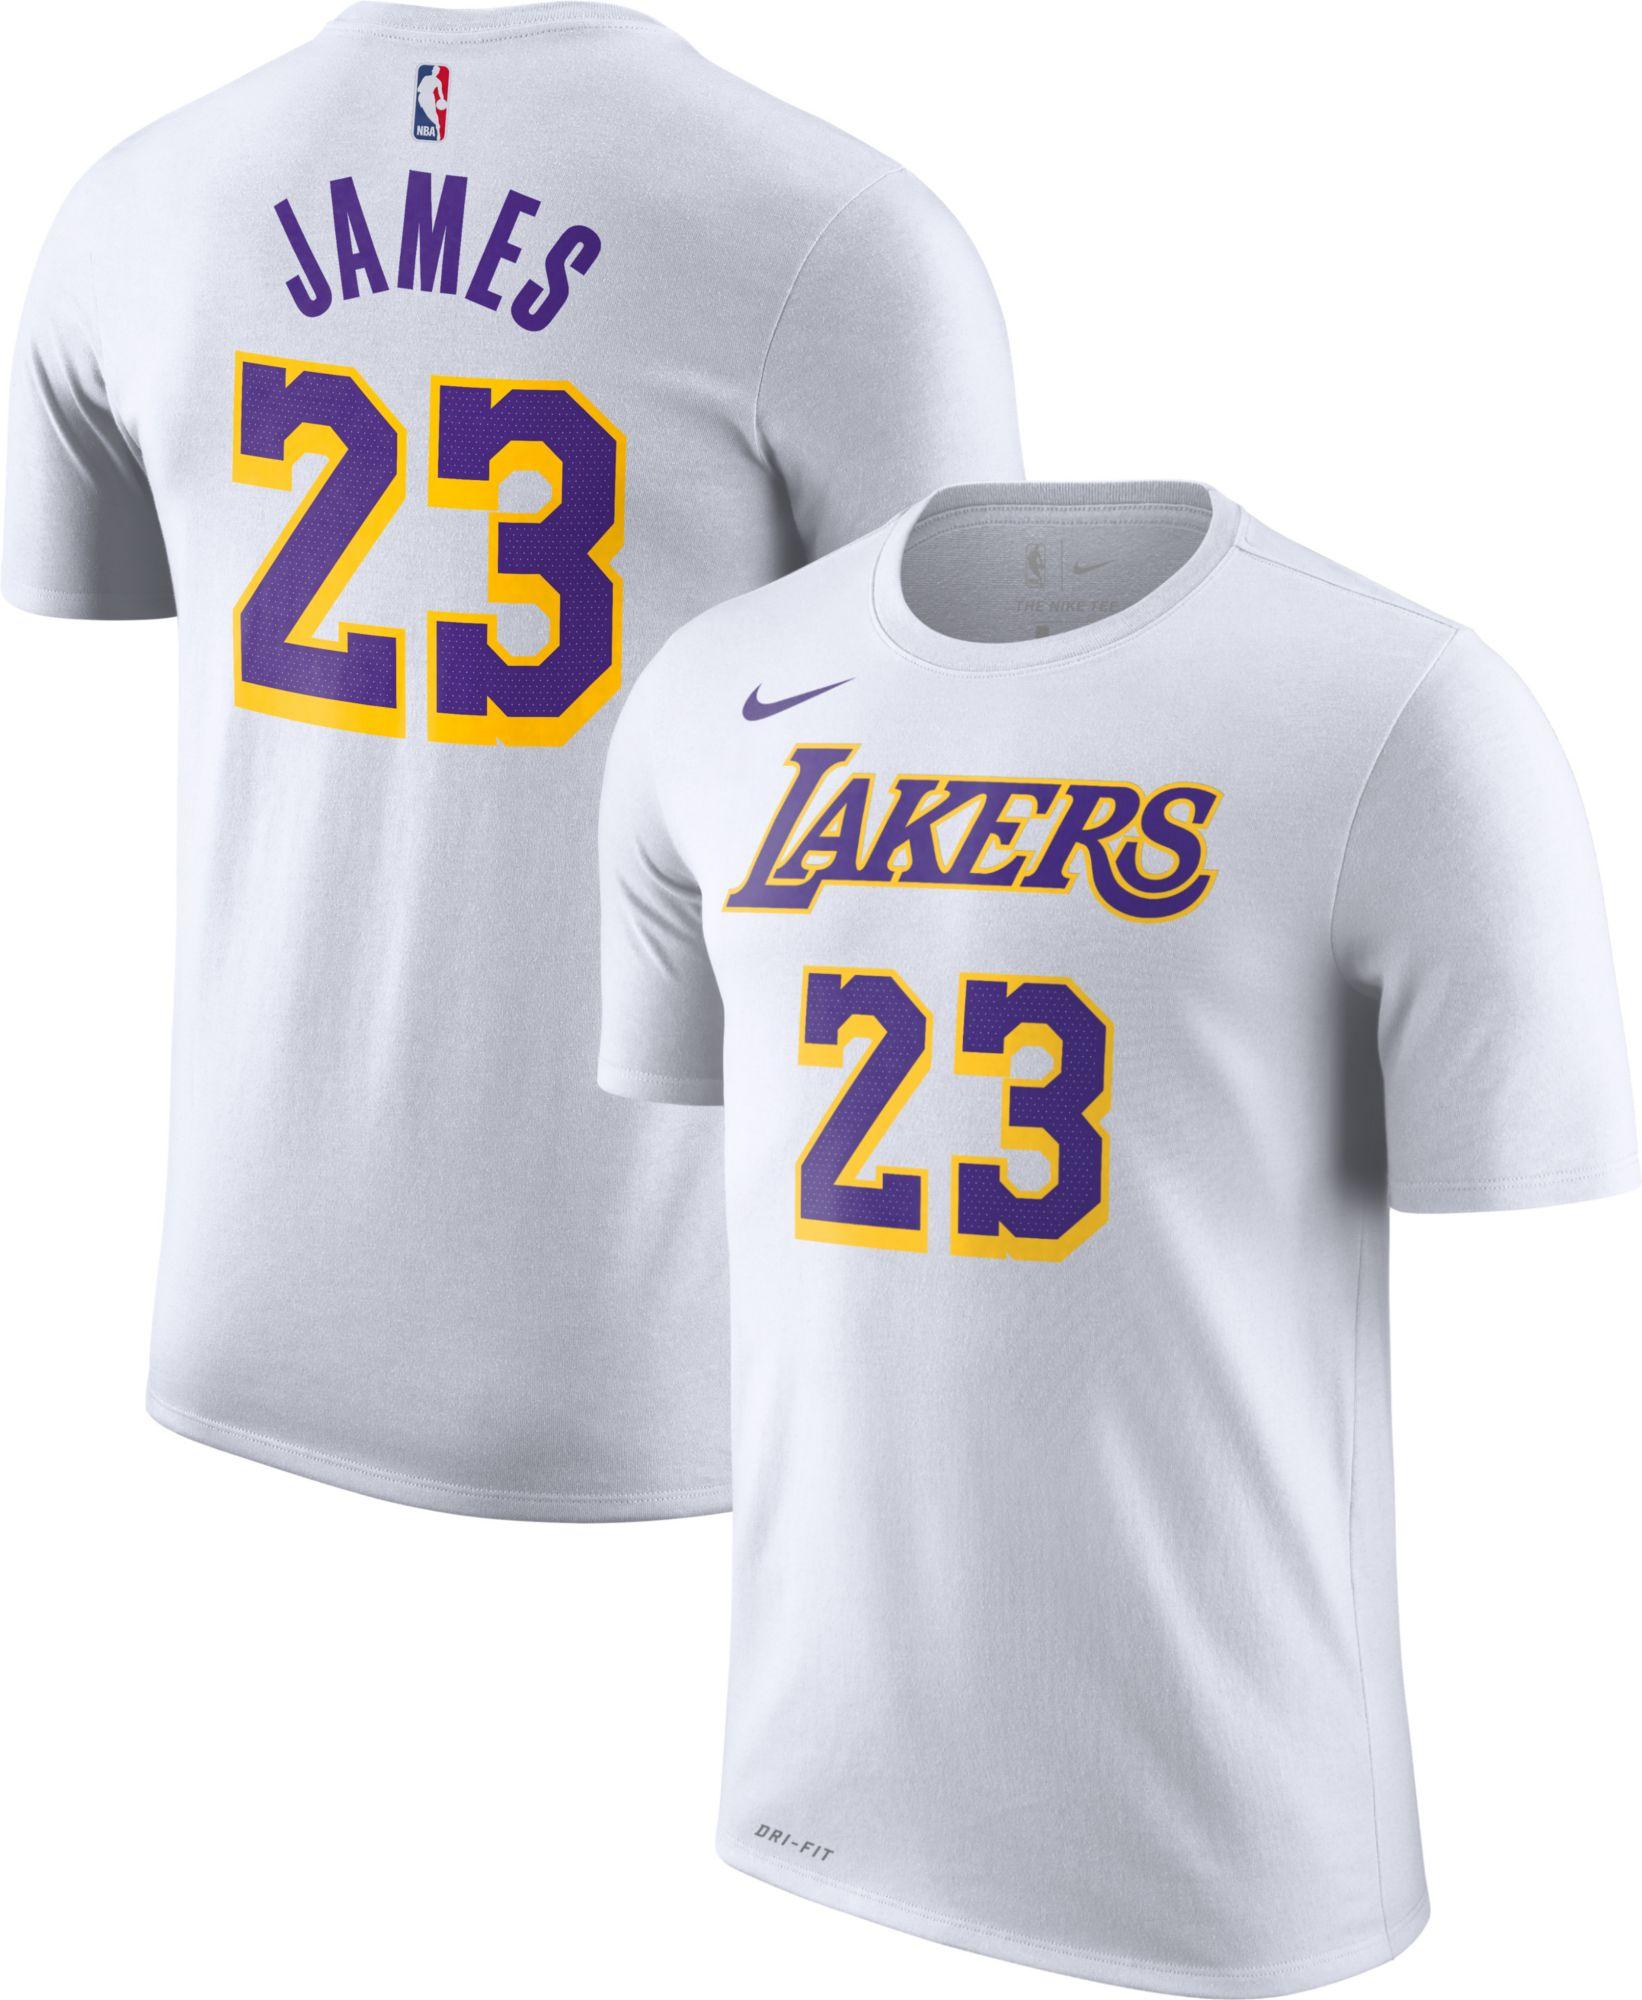 cheap for discount 6e4b8 8b812 buy-lebron-james-jersey